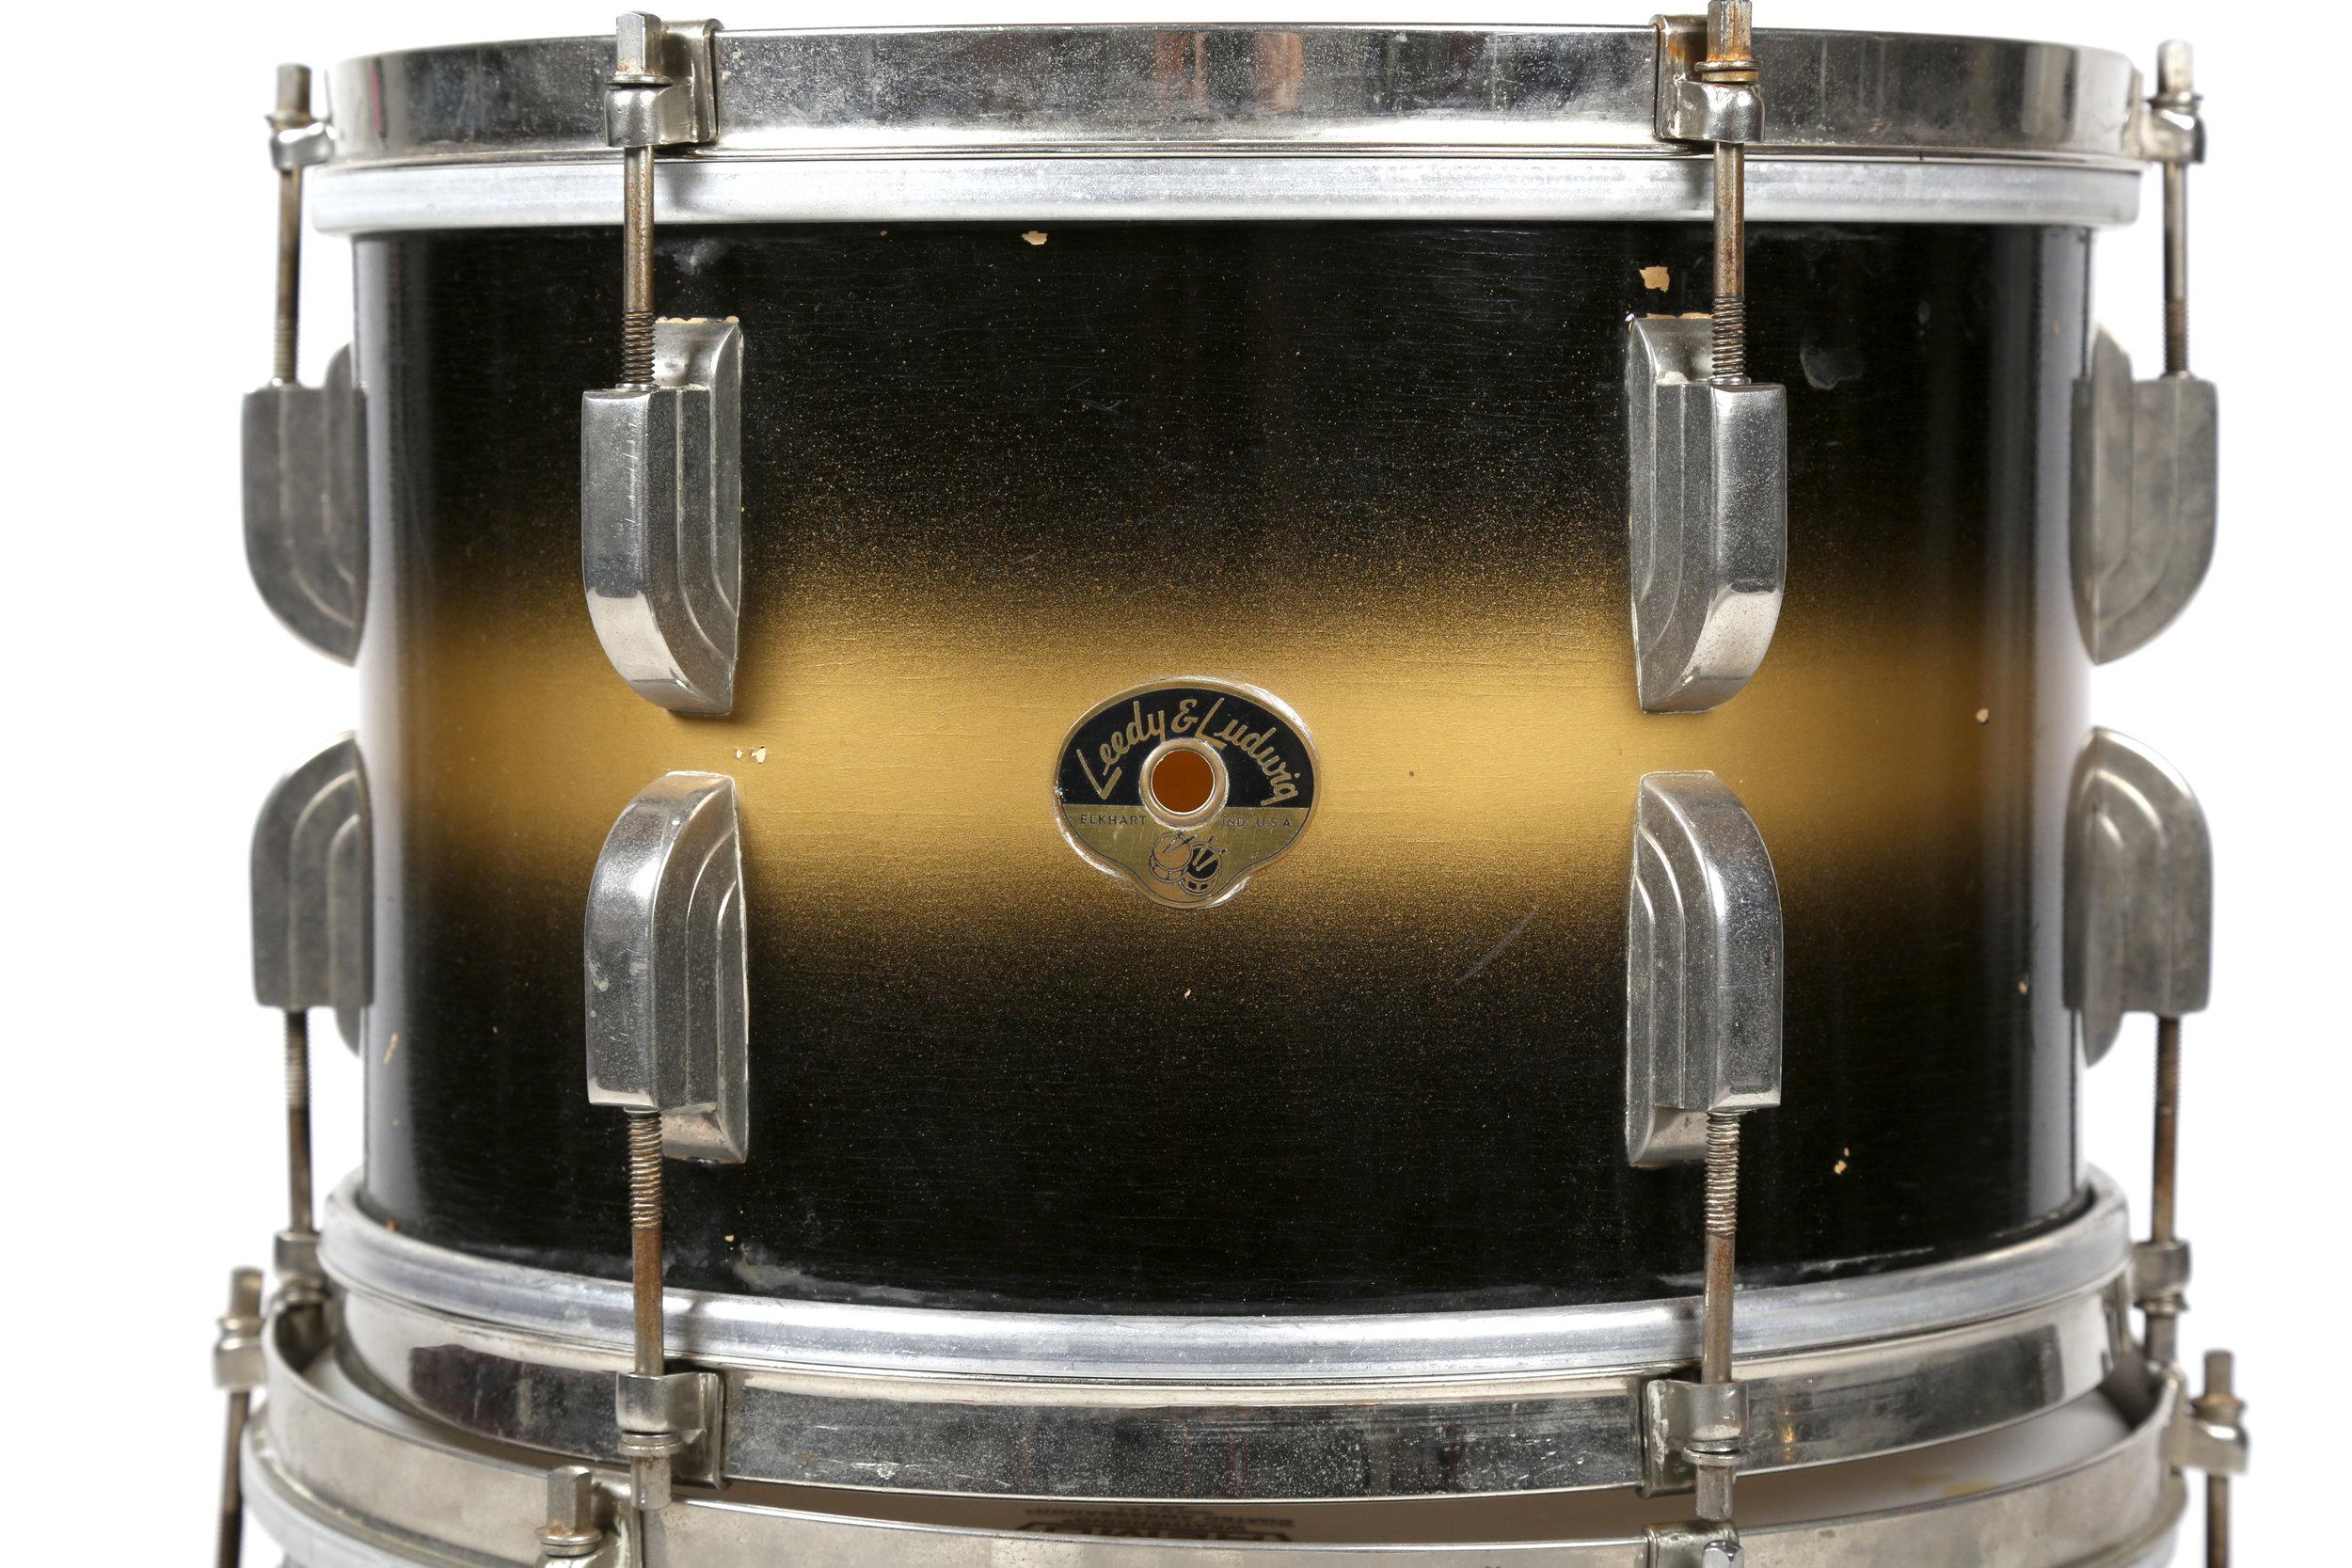 Dorio Vintage Drum_C&C Big Red_1953.jpg